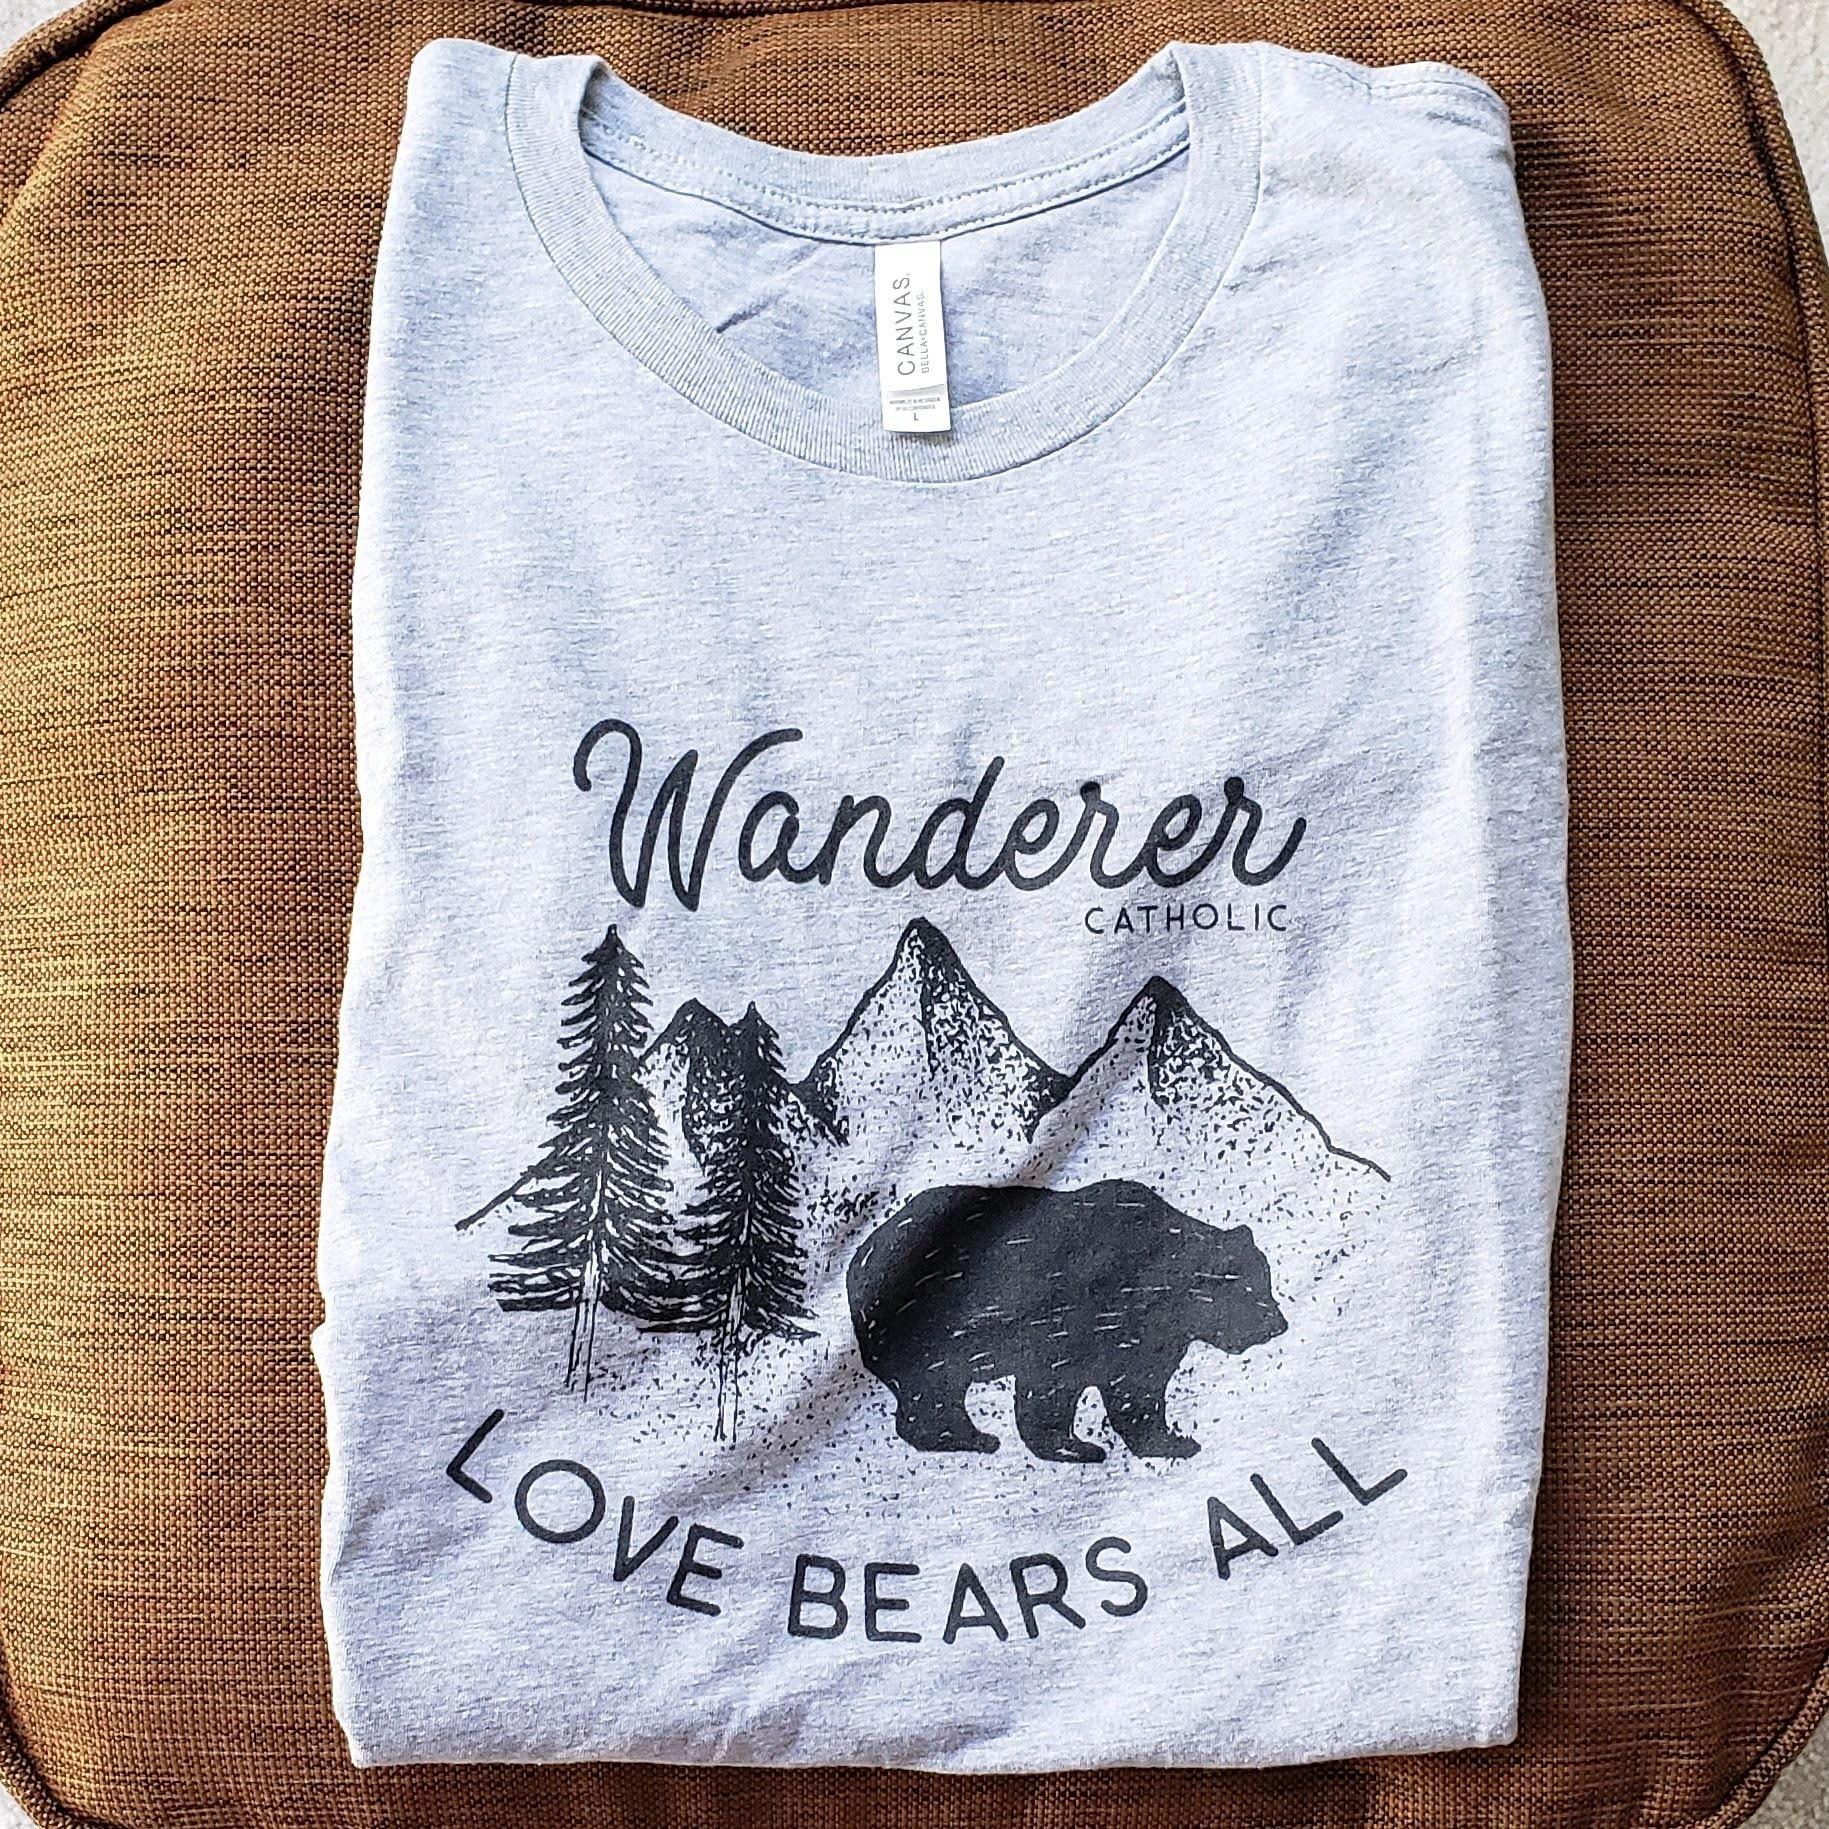 Love Bears All Tee - Wanderer Catholic